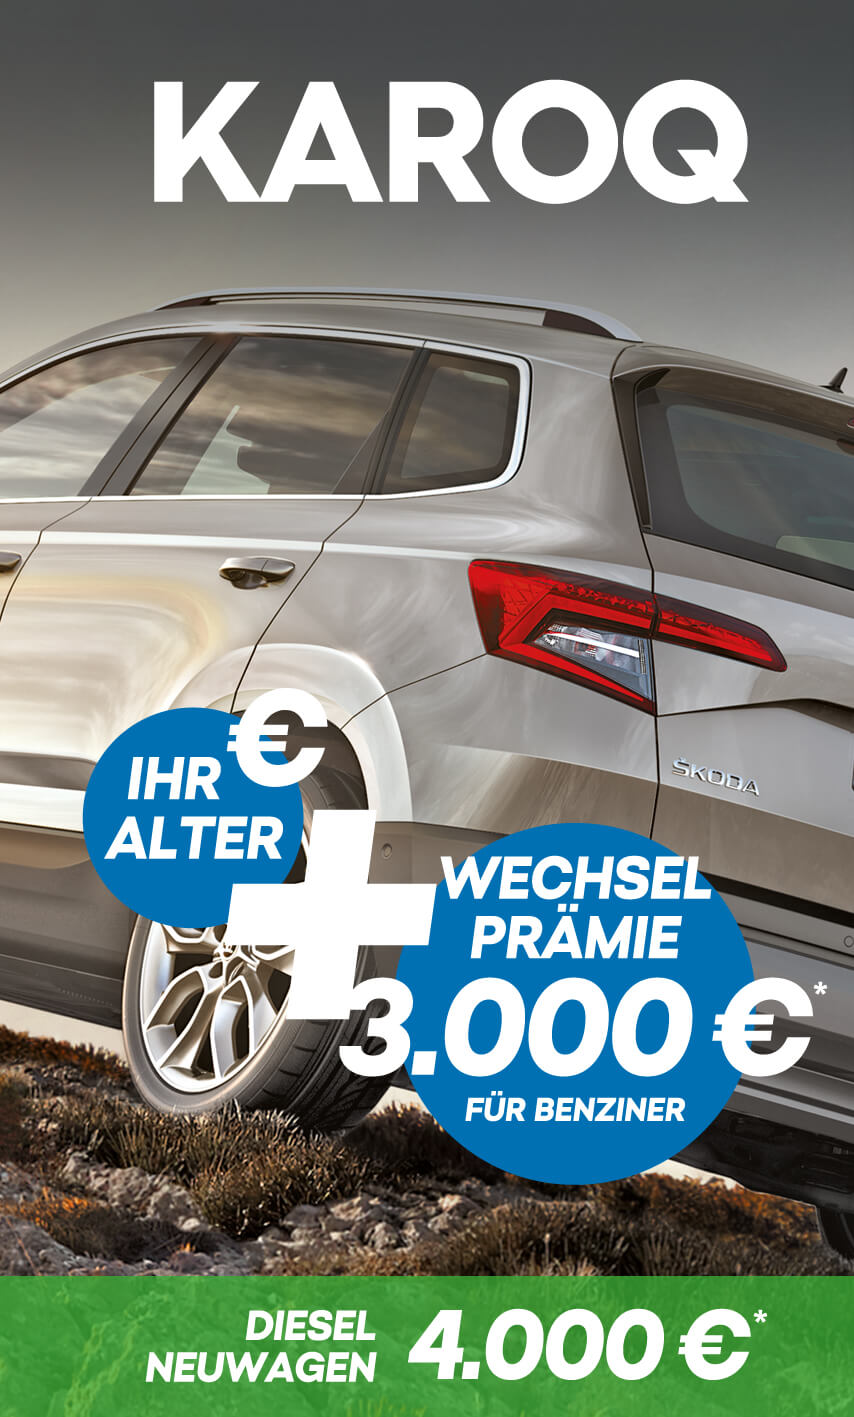 Škoda Wechselprämie bei Autohaus Biering